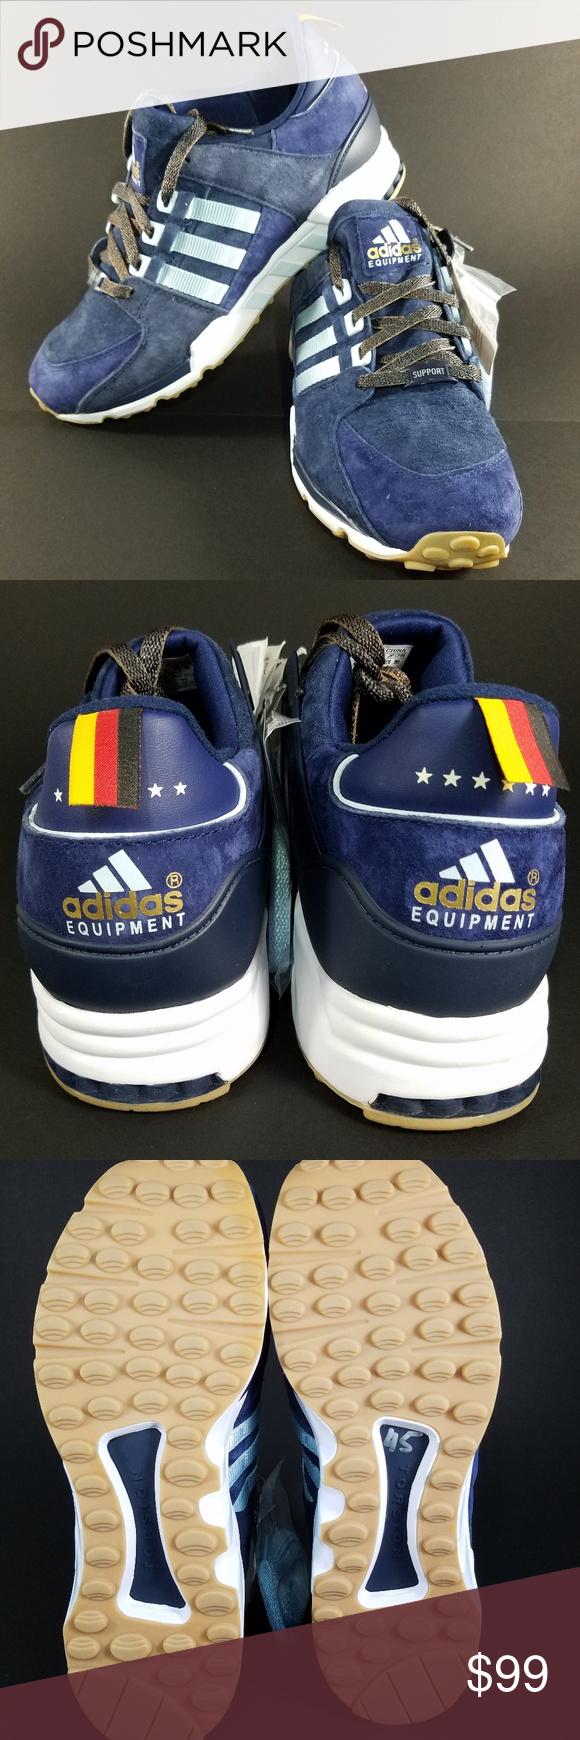 27dc95599cff Adidas Men s Navy Retro Berlin Marathon 93  New Brand  Adidas Product Line  EQT  93 Equipment Berlin Marathon LTD Size  9.5  10.5  11.5  12 Gender  Men s ...